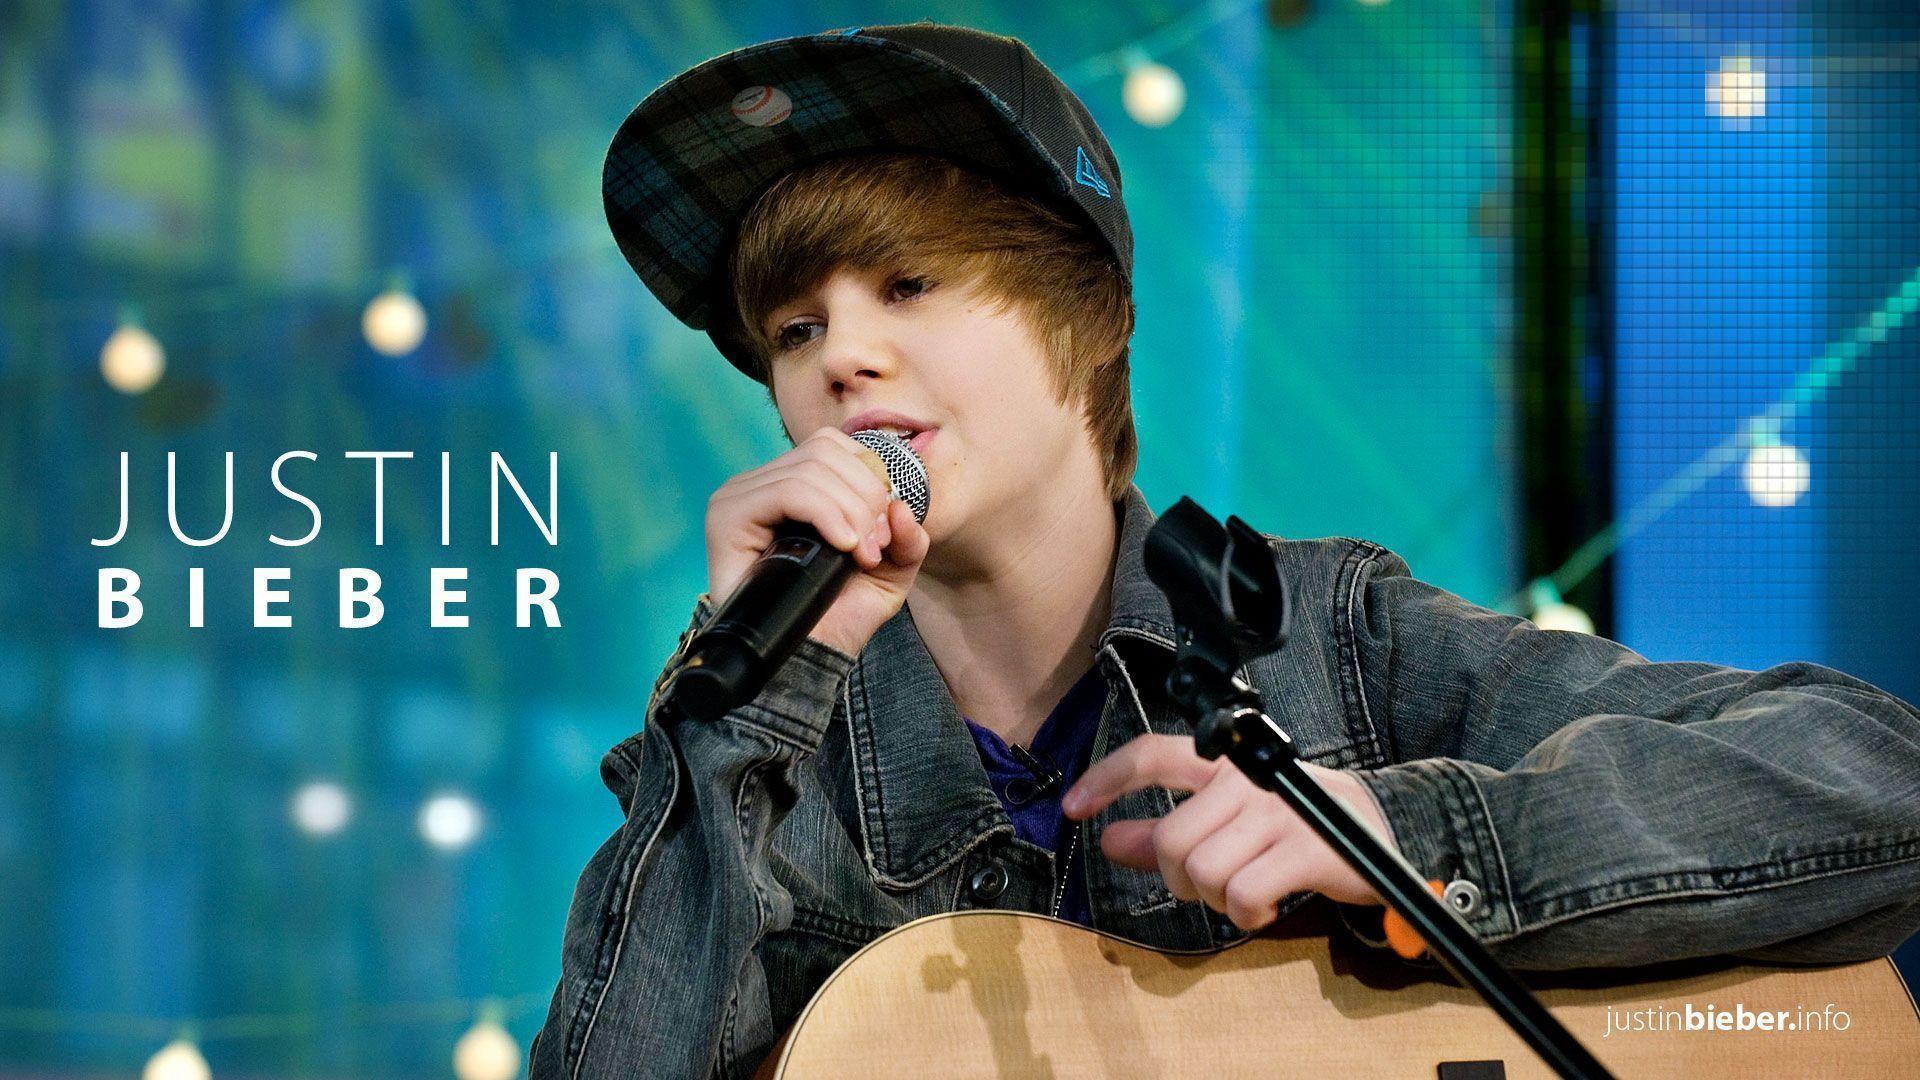 Justin Bieber Latest Photoshoot Full Hd Wallpaper: Justin Bieber New Wallpapers 2016